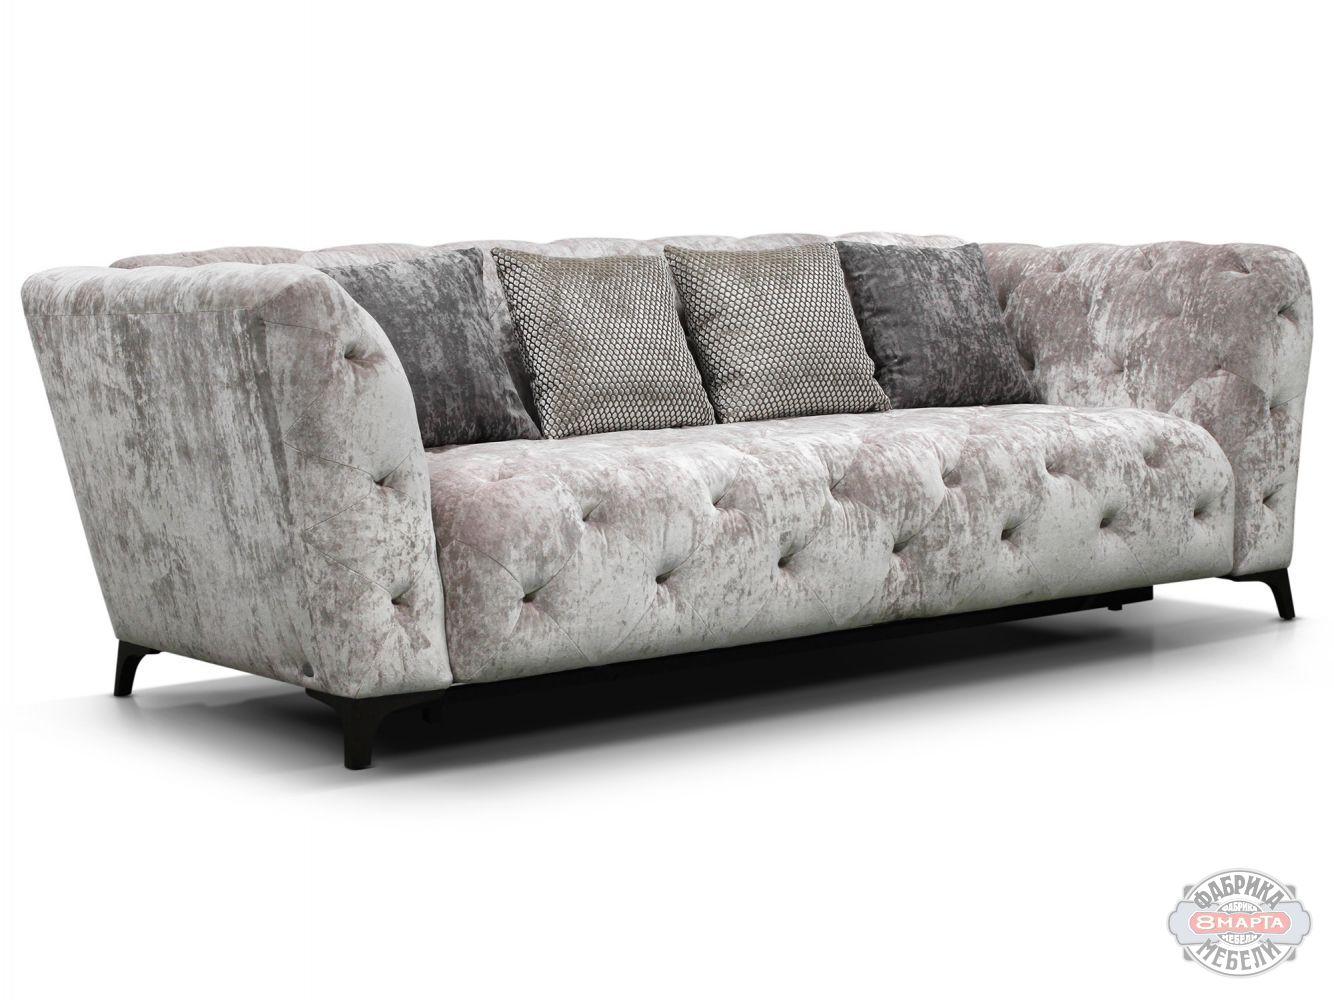 Модульный диван Люмьер, фото 9